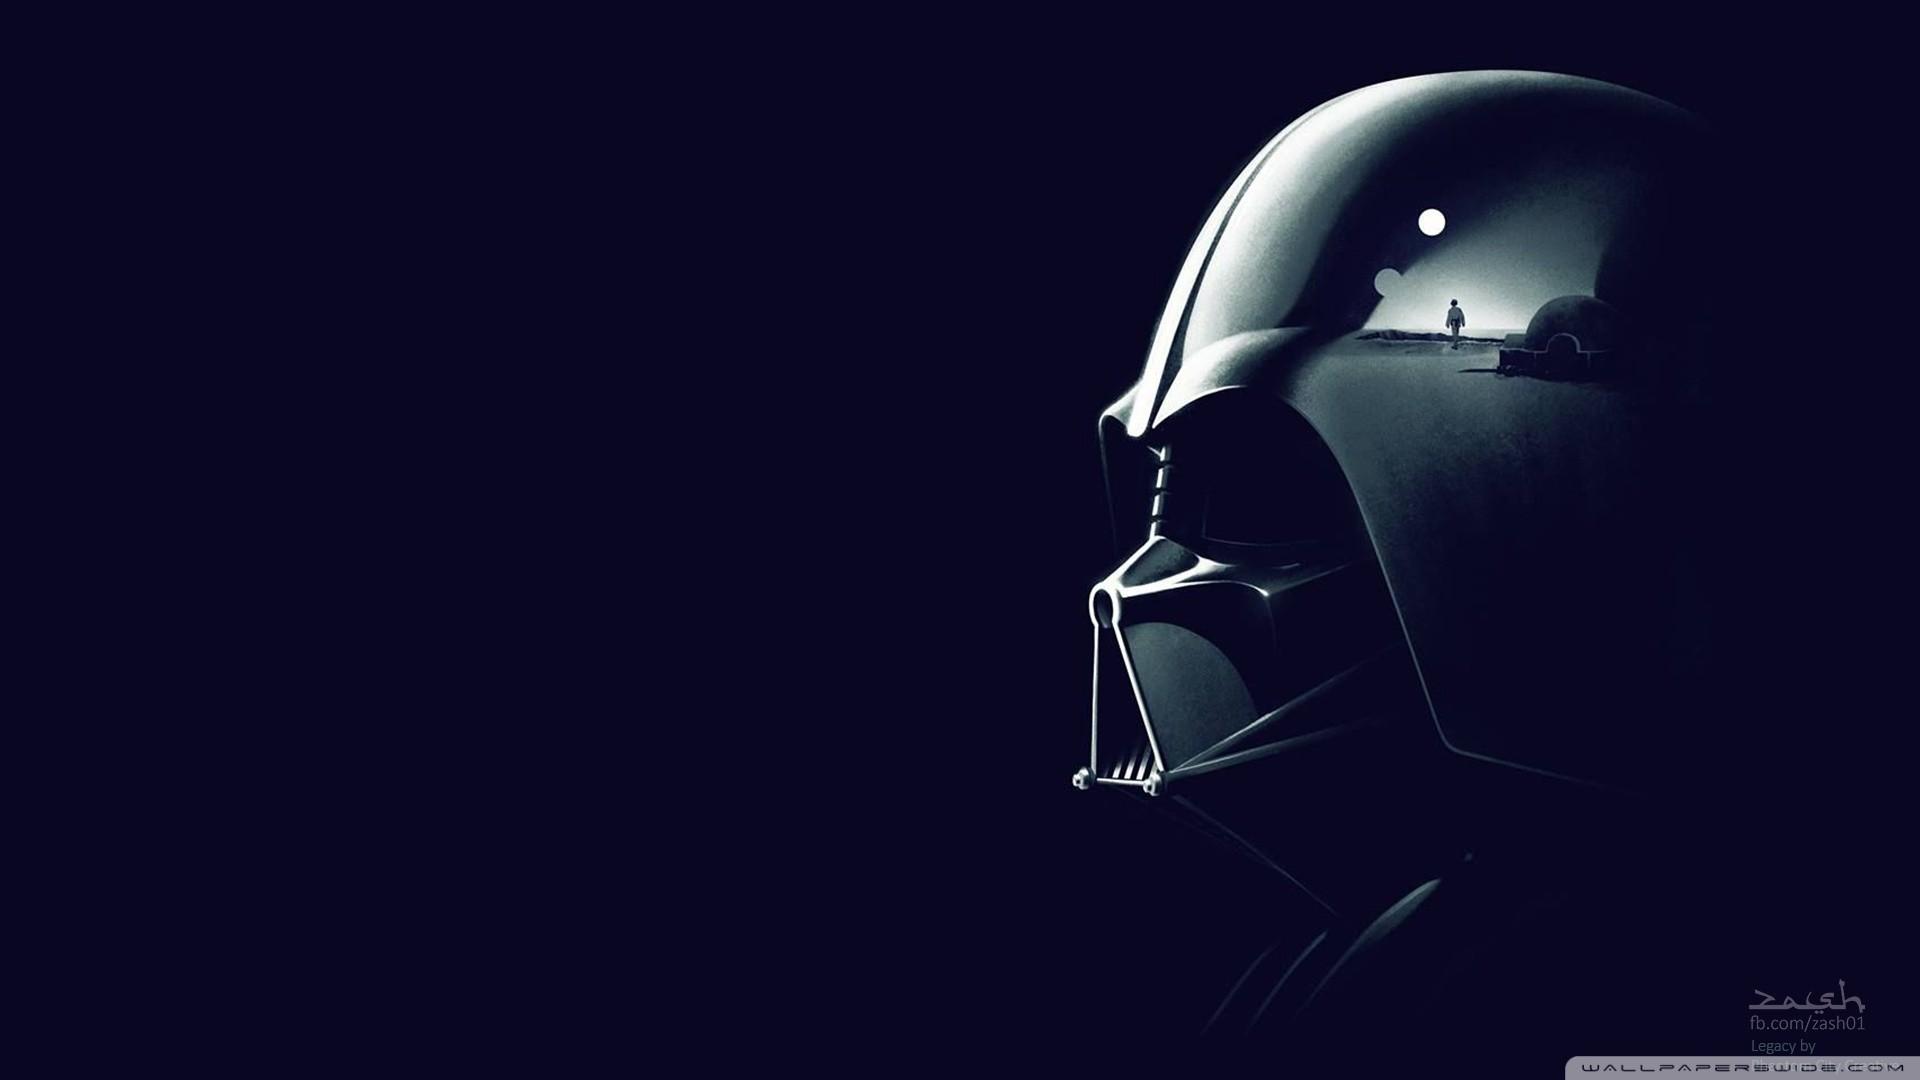 Star Wars HD Wide Wallpaper for Widescreen